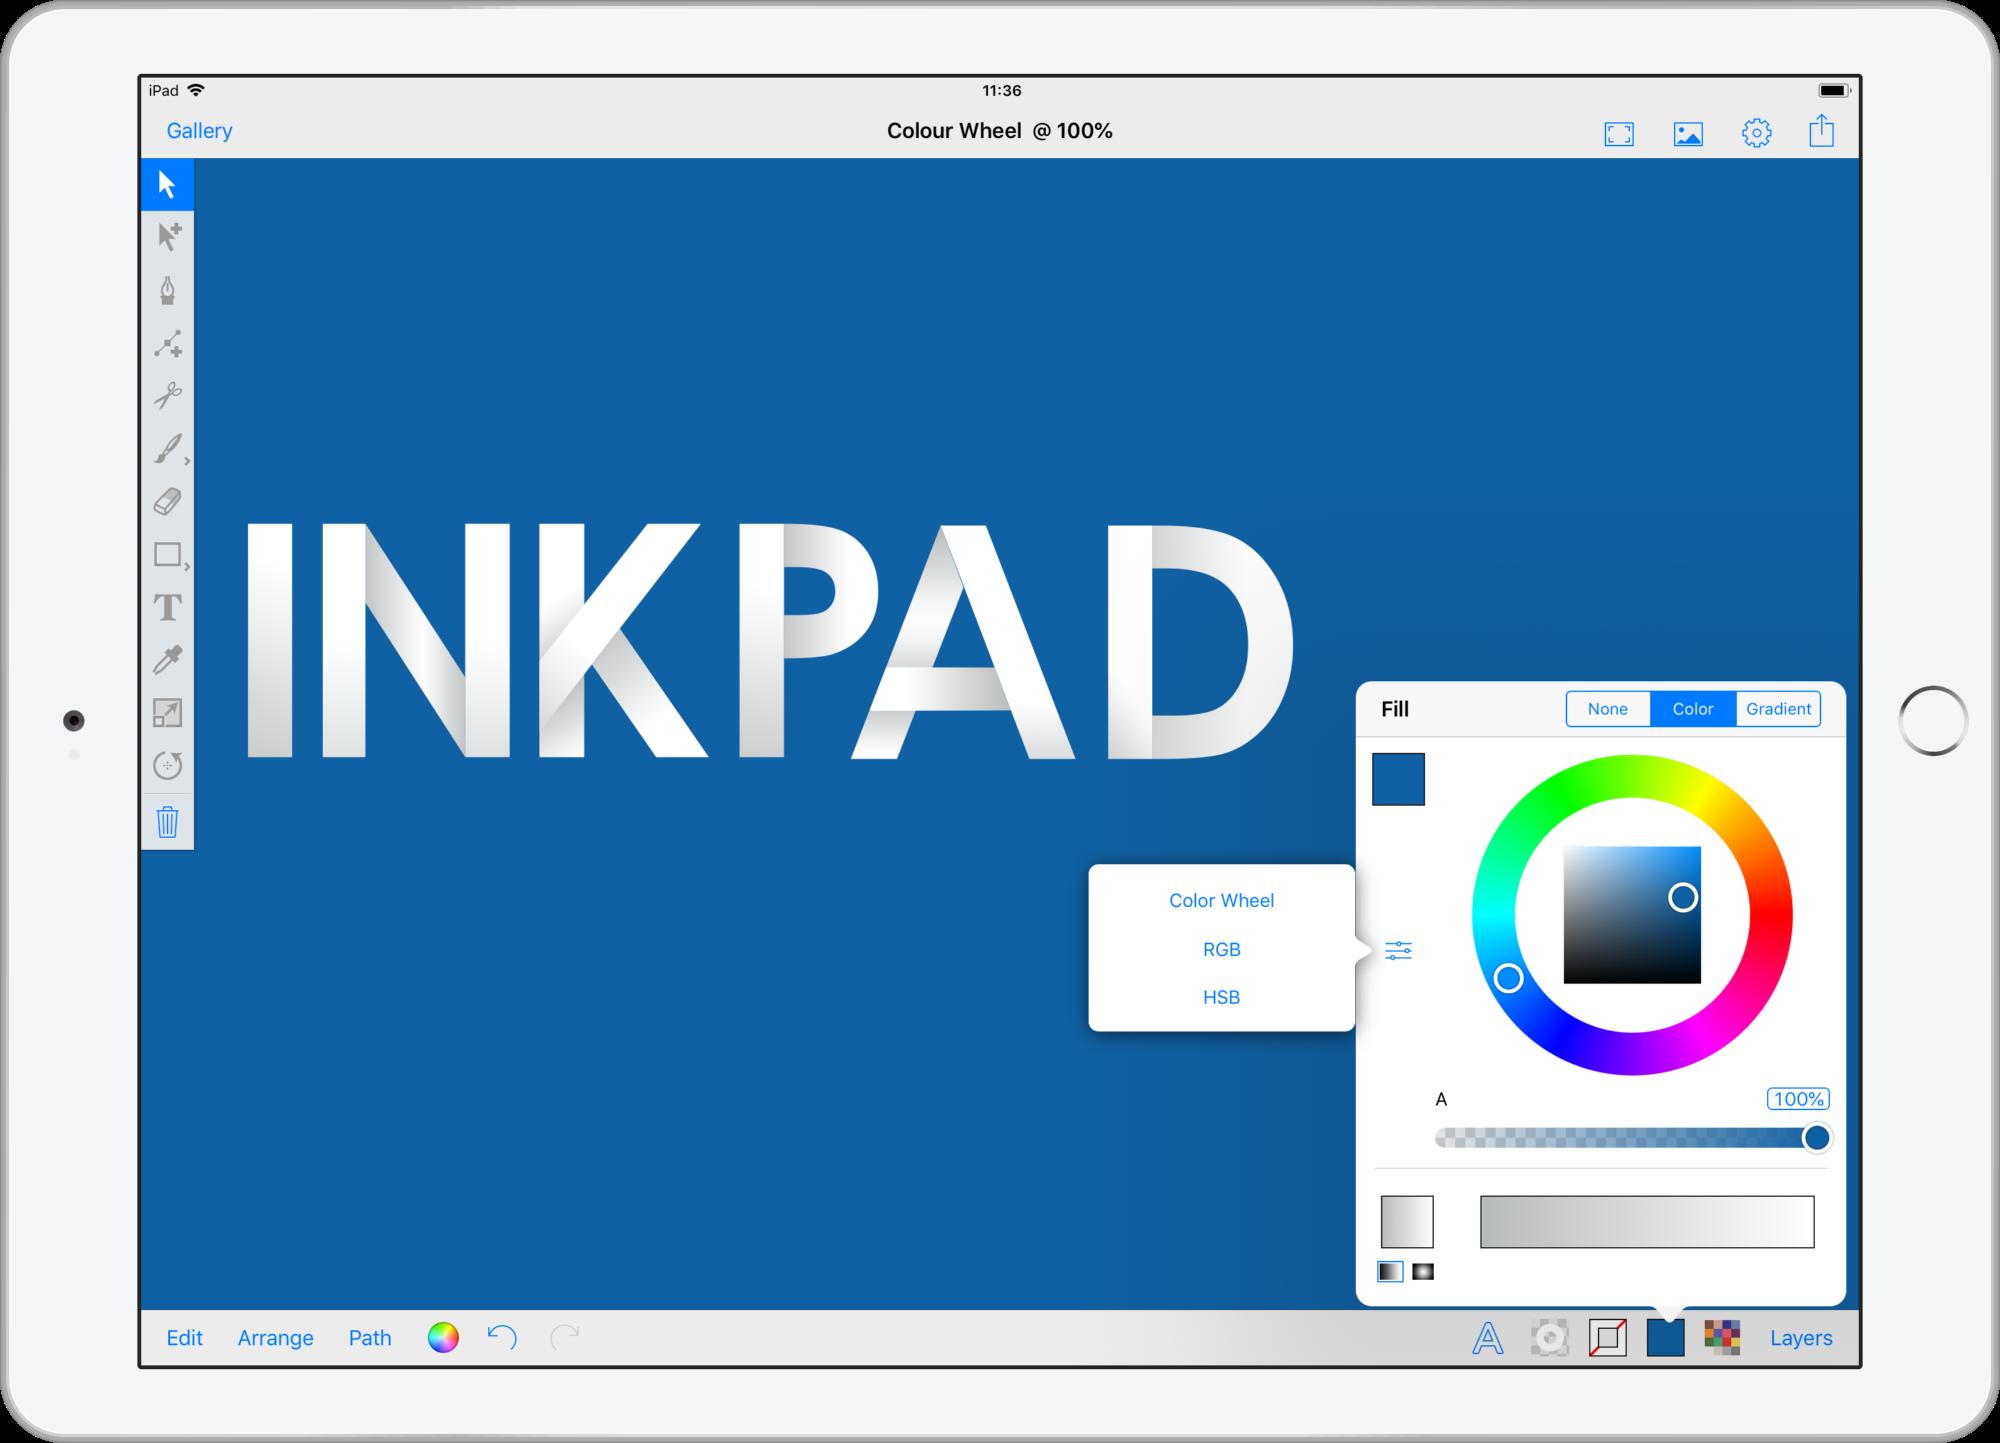 Inkpad HSB color wheel